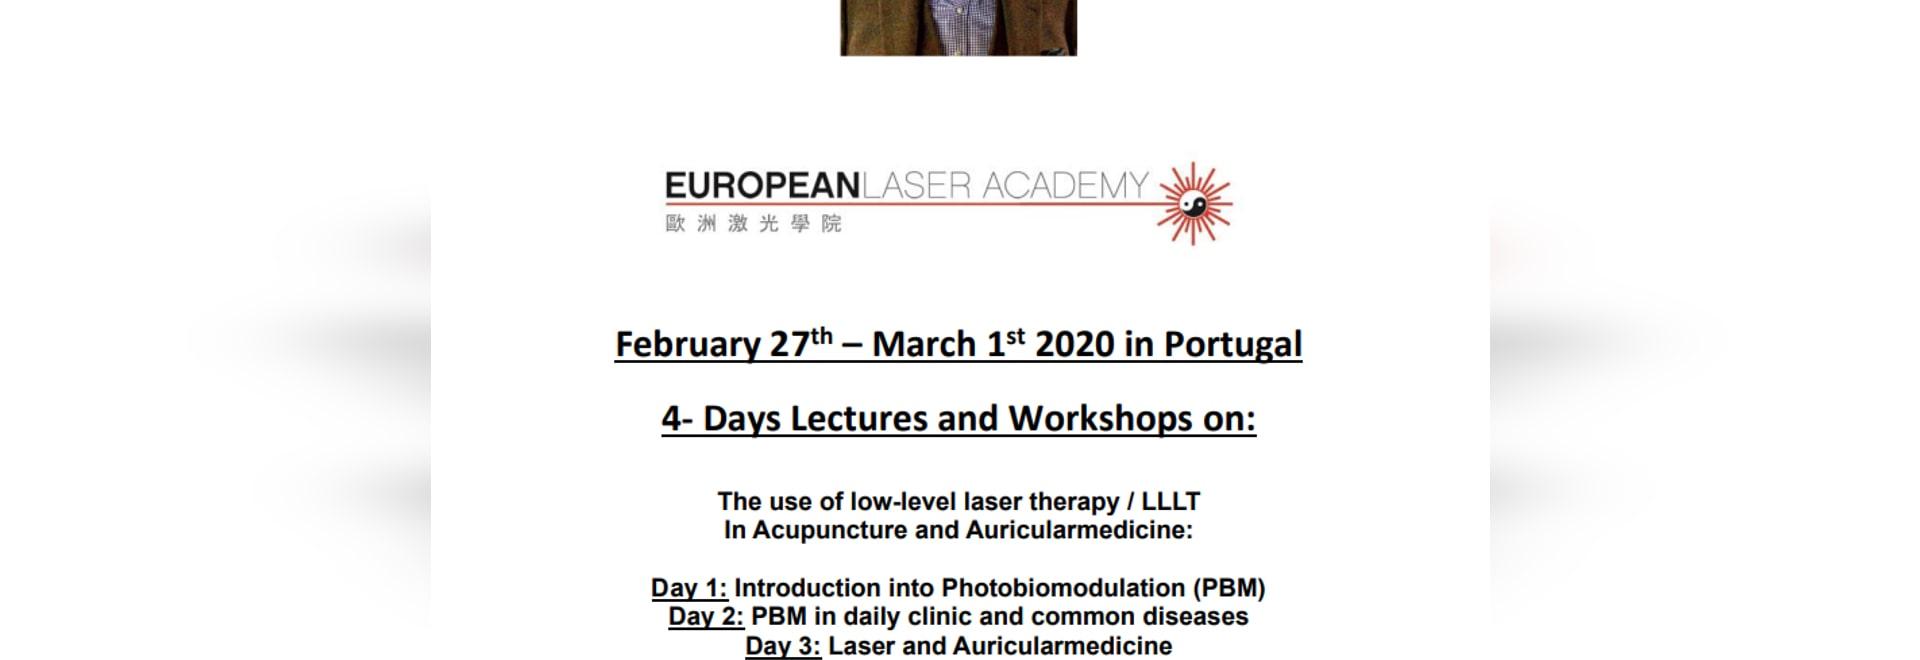 Seminario Laser ad Algarve Portogallo dal 27 febbraio al 01 marzo, a cura del Dr. Michael Weber MD CM CM Acup Laser Specialist dalla Germania.